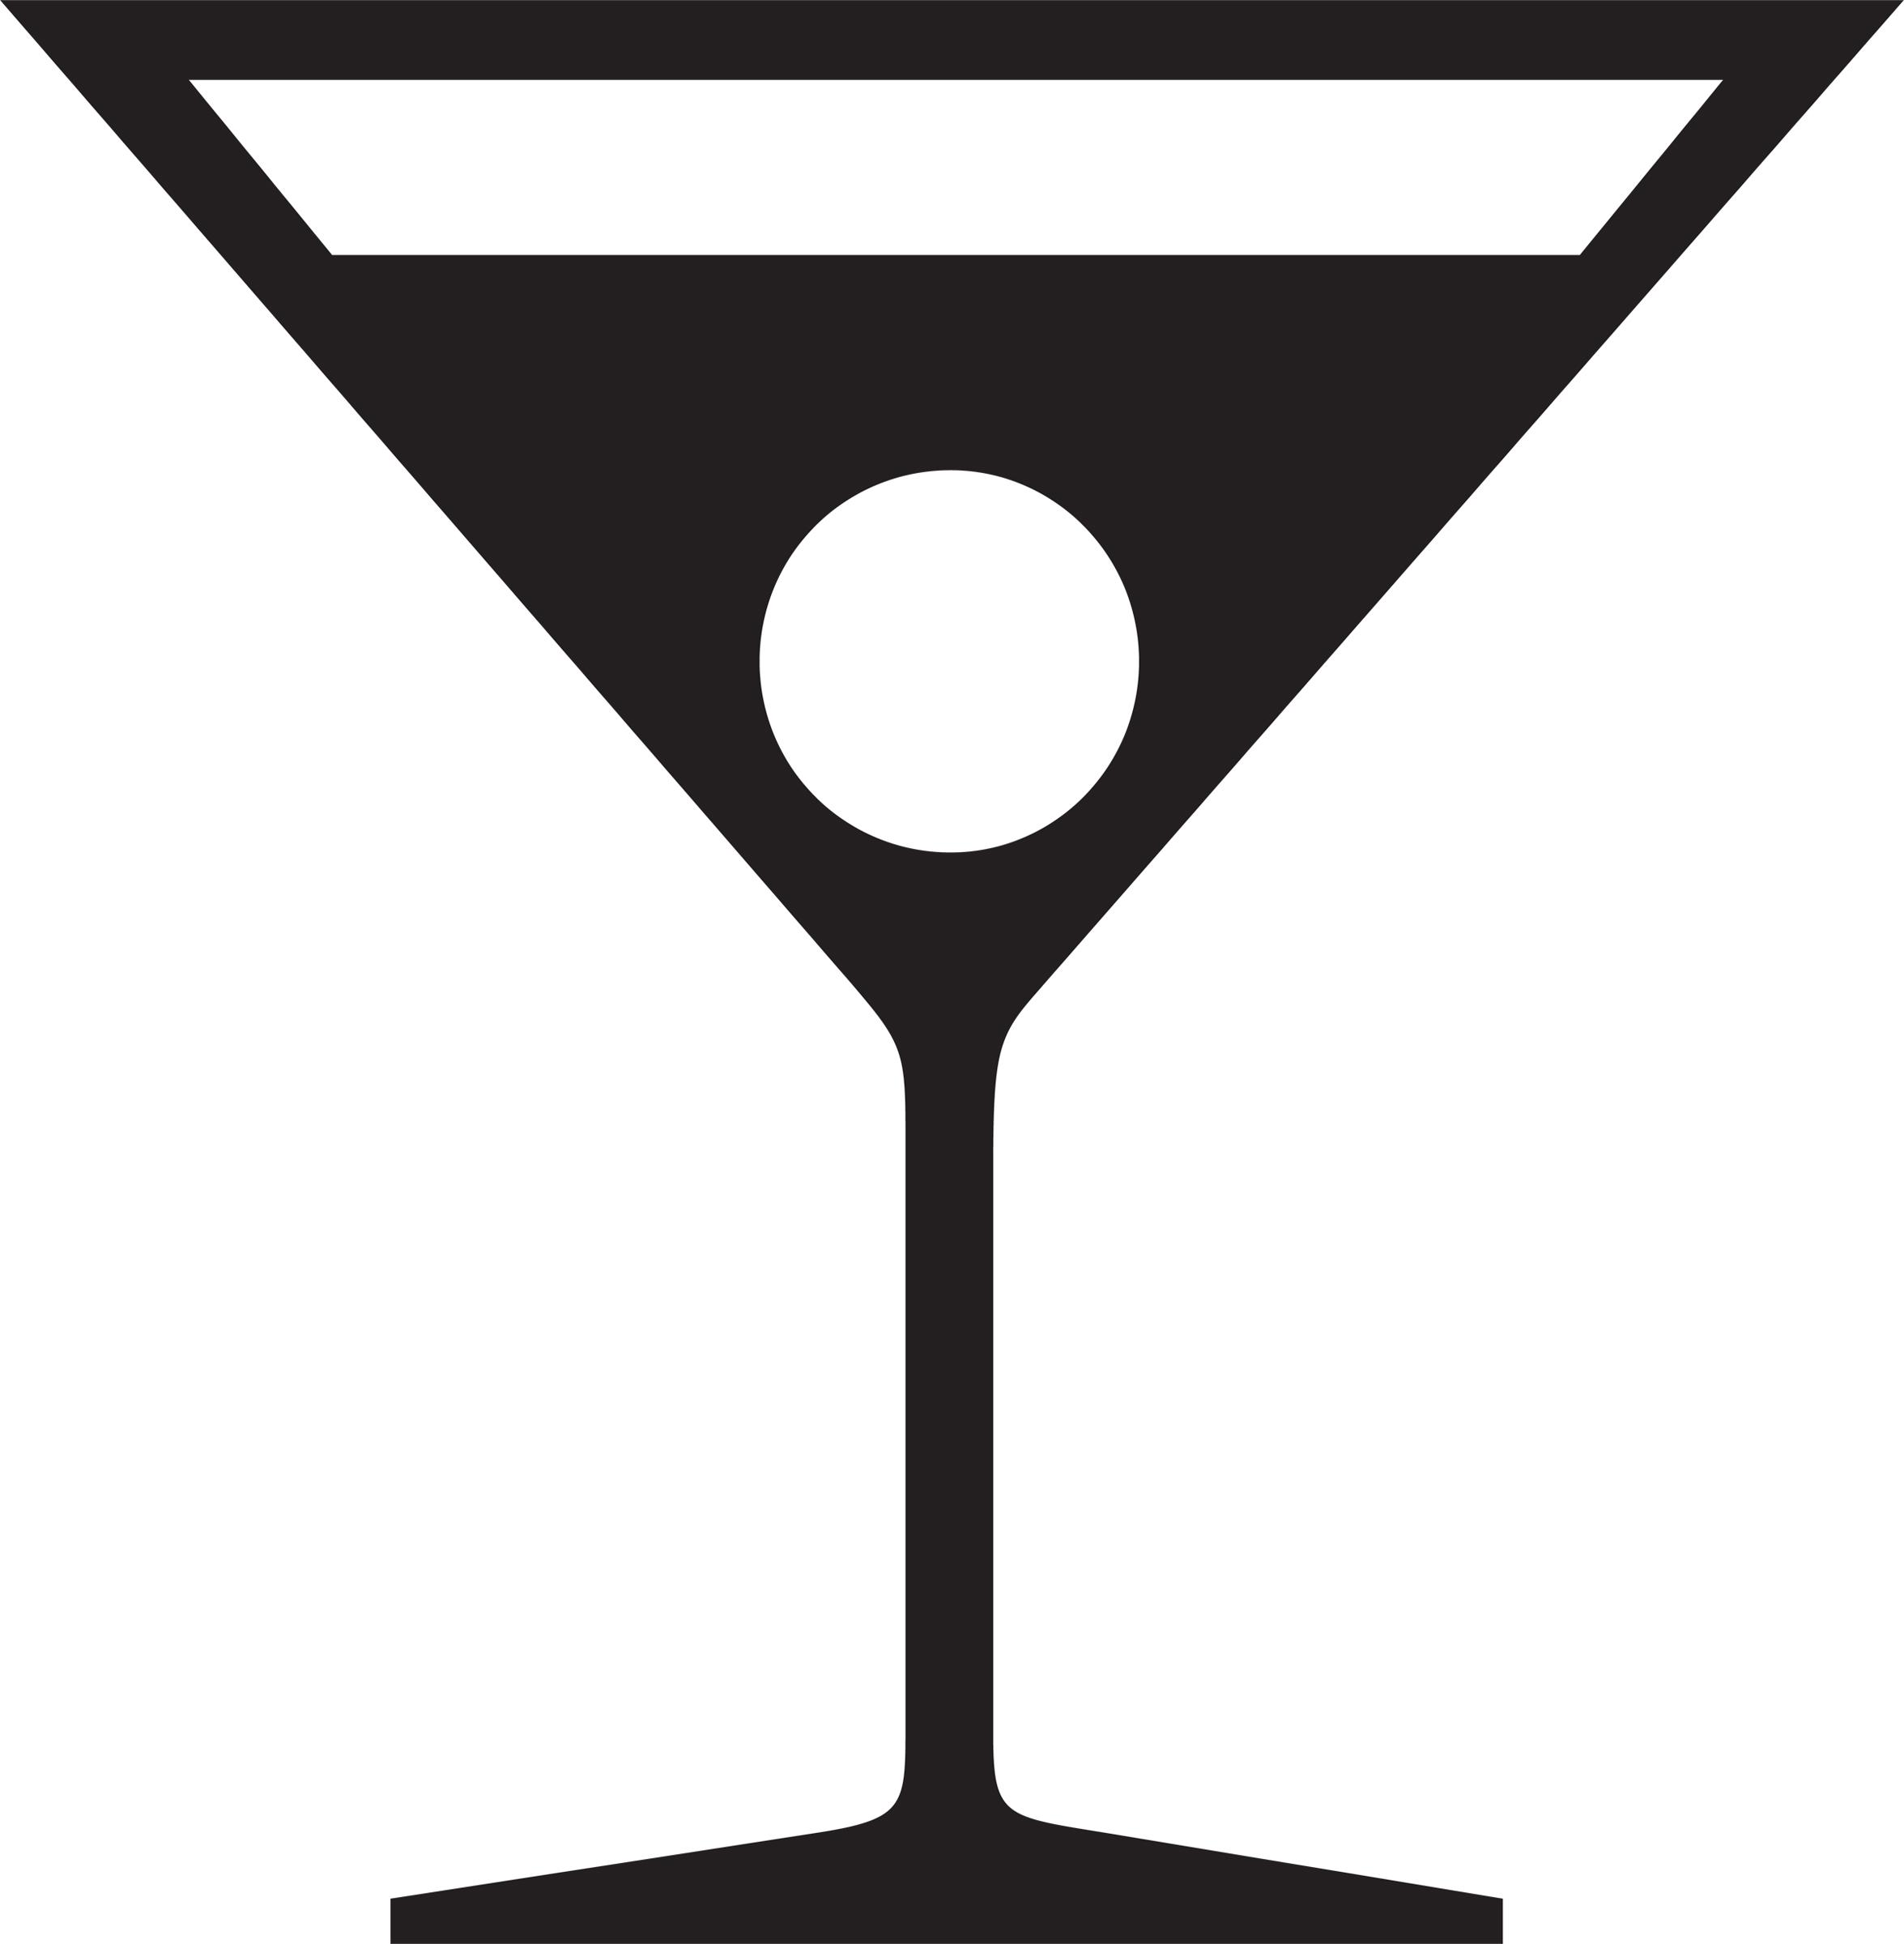 2351x2400 Margarita Cocktail Glass Clipart